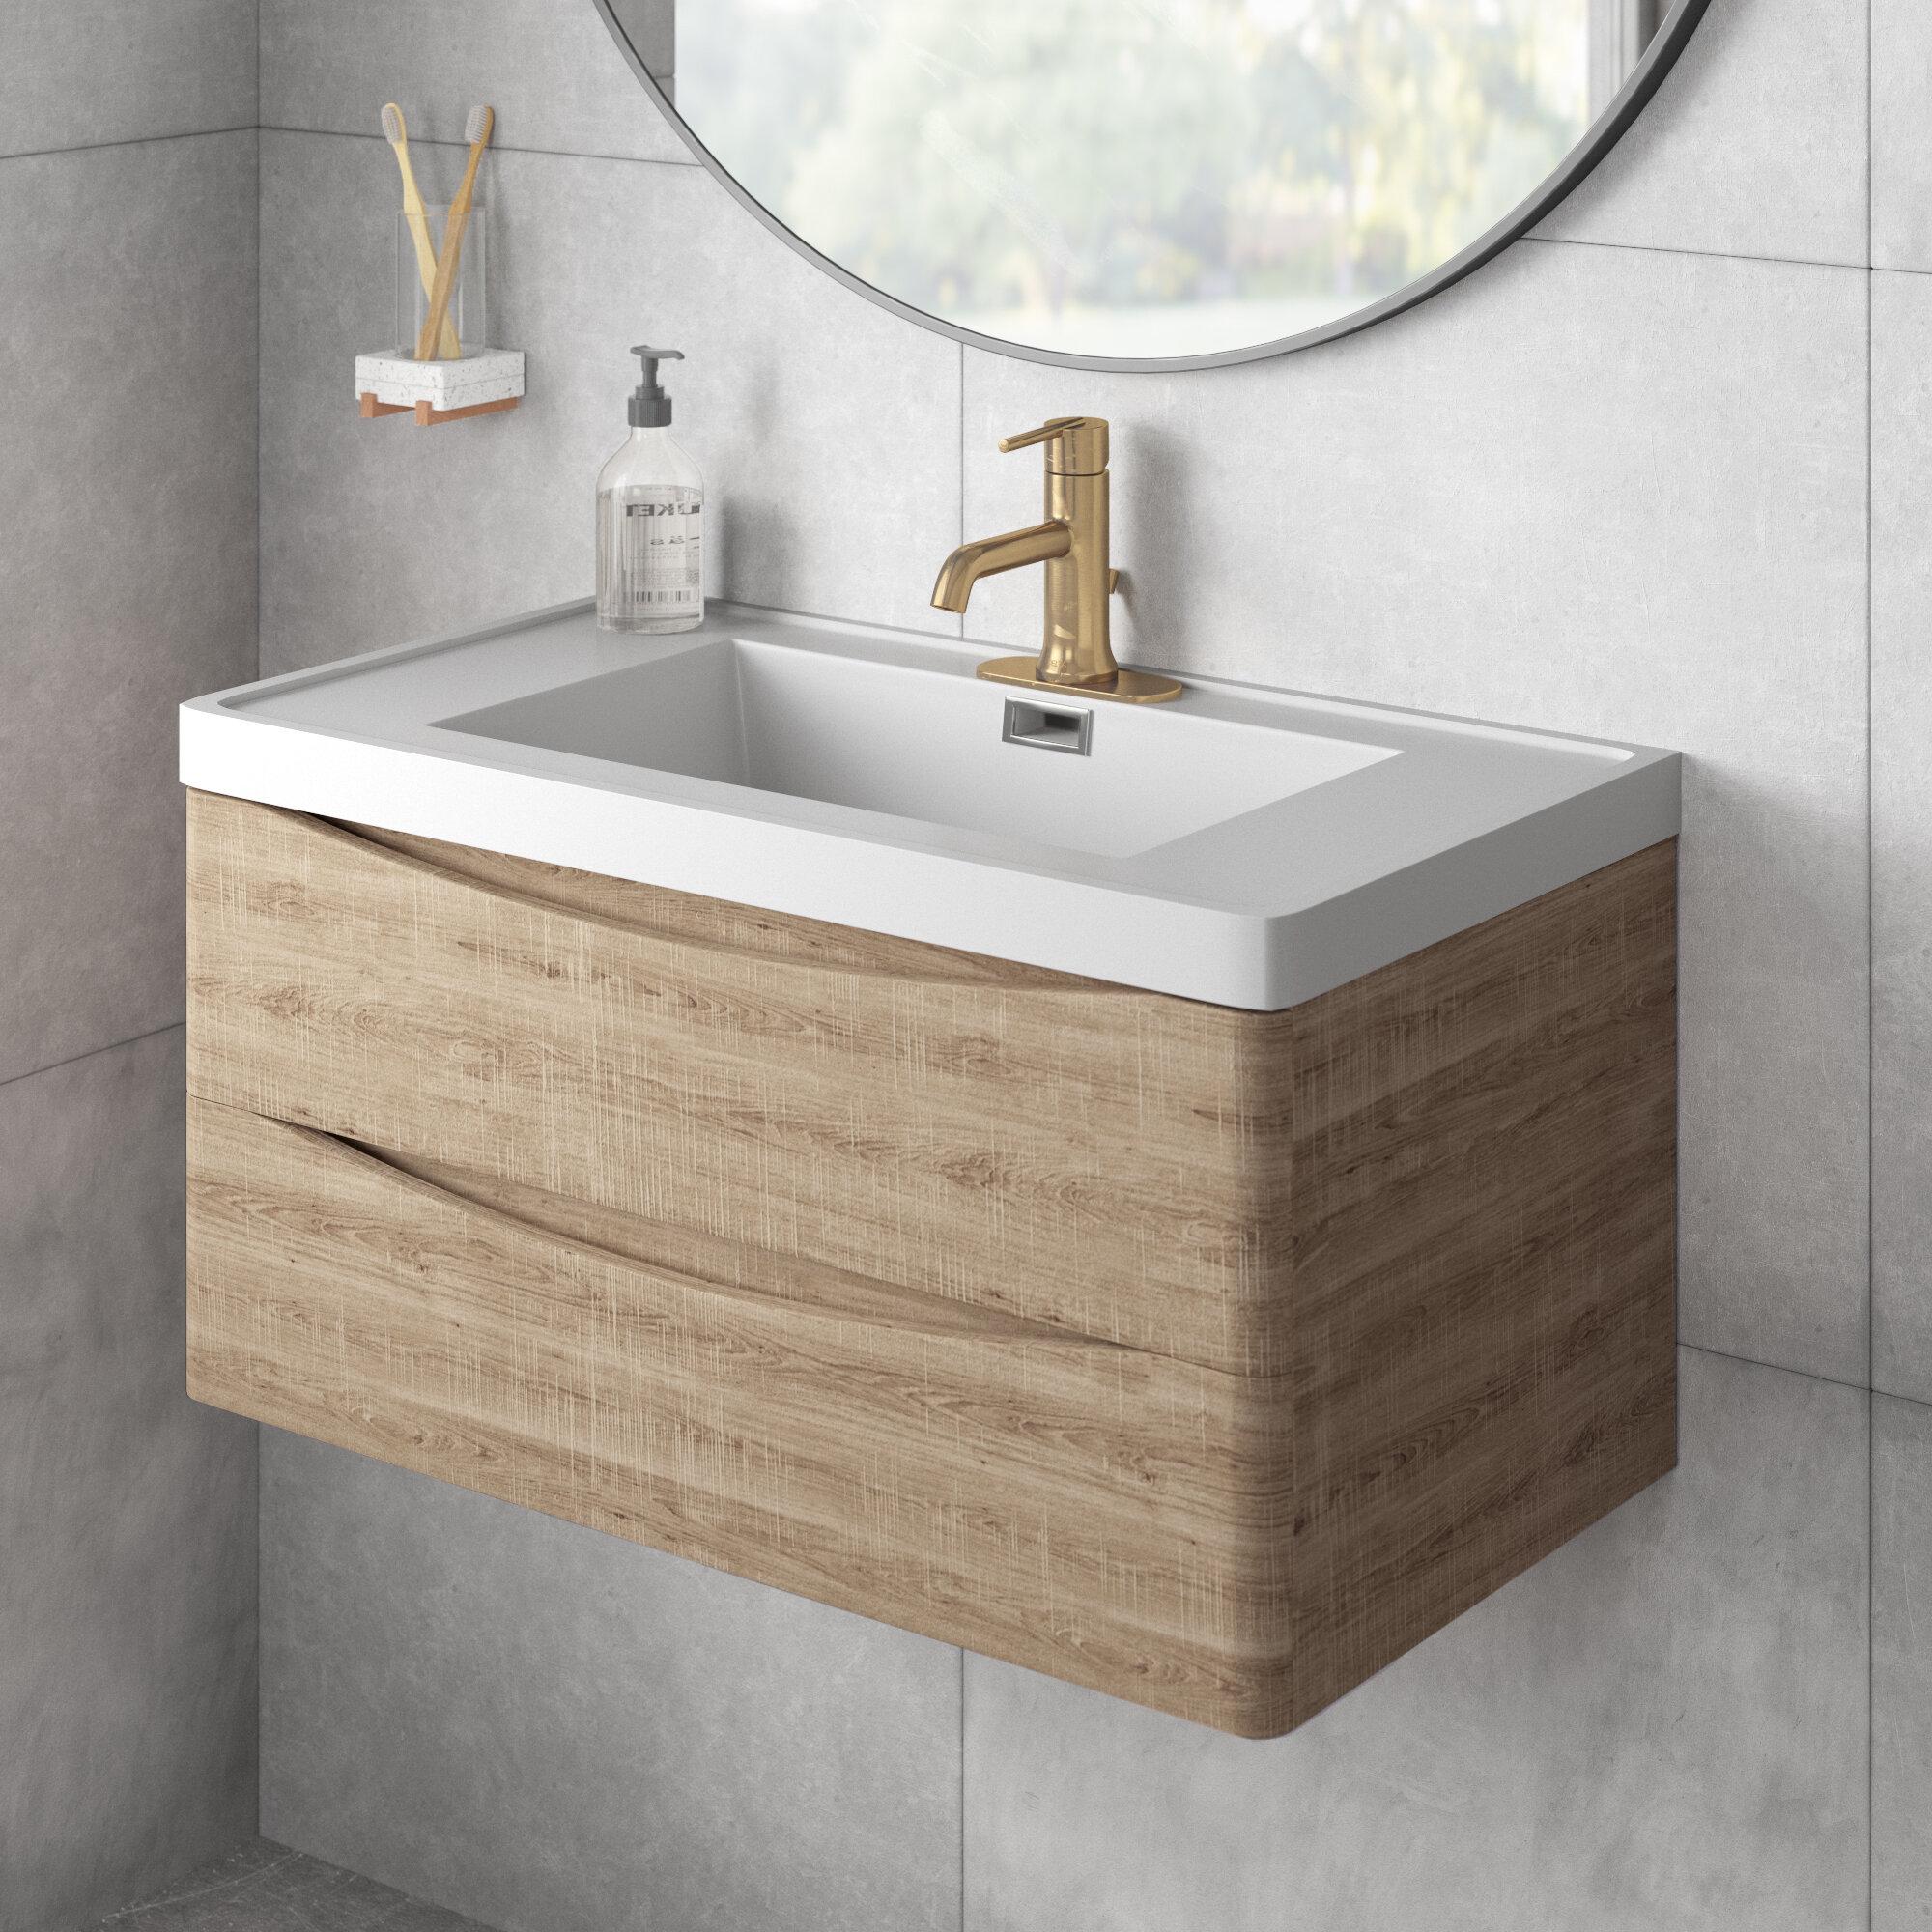 Trent Austin Design Blondene Modern 30 Single Bathroom Vanity Set Reviews Wayfair